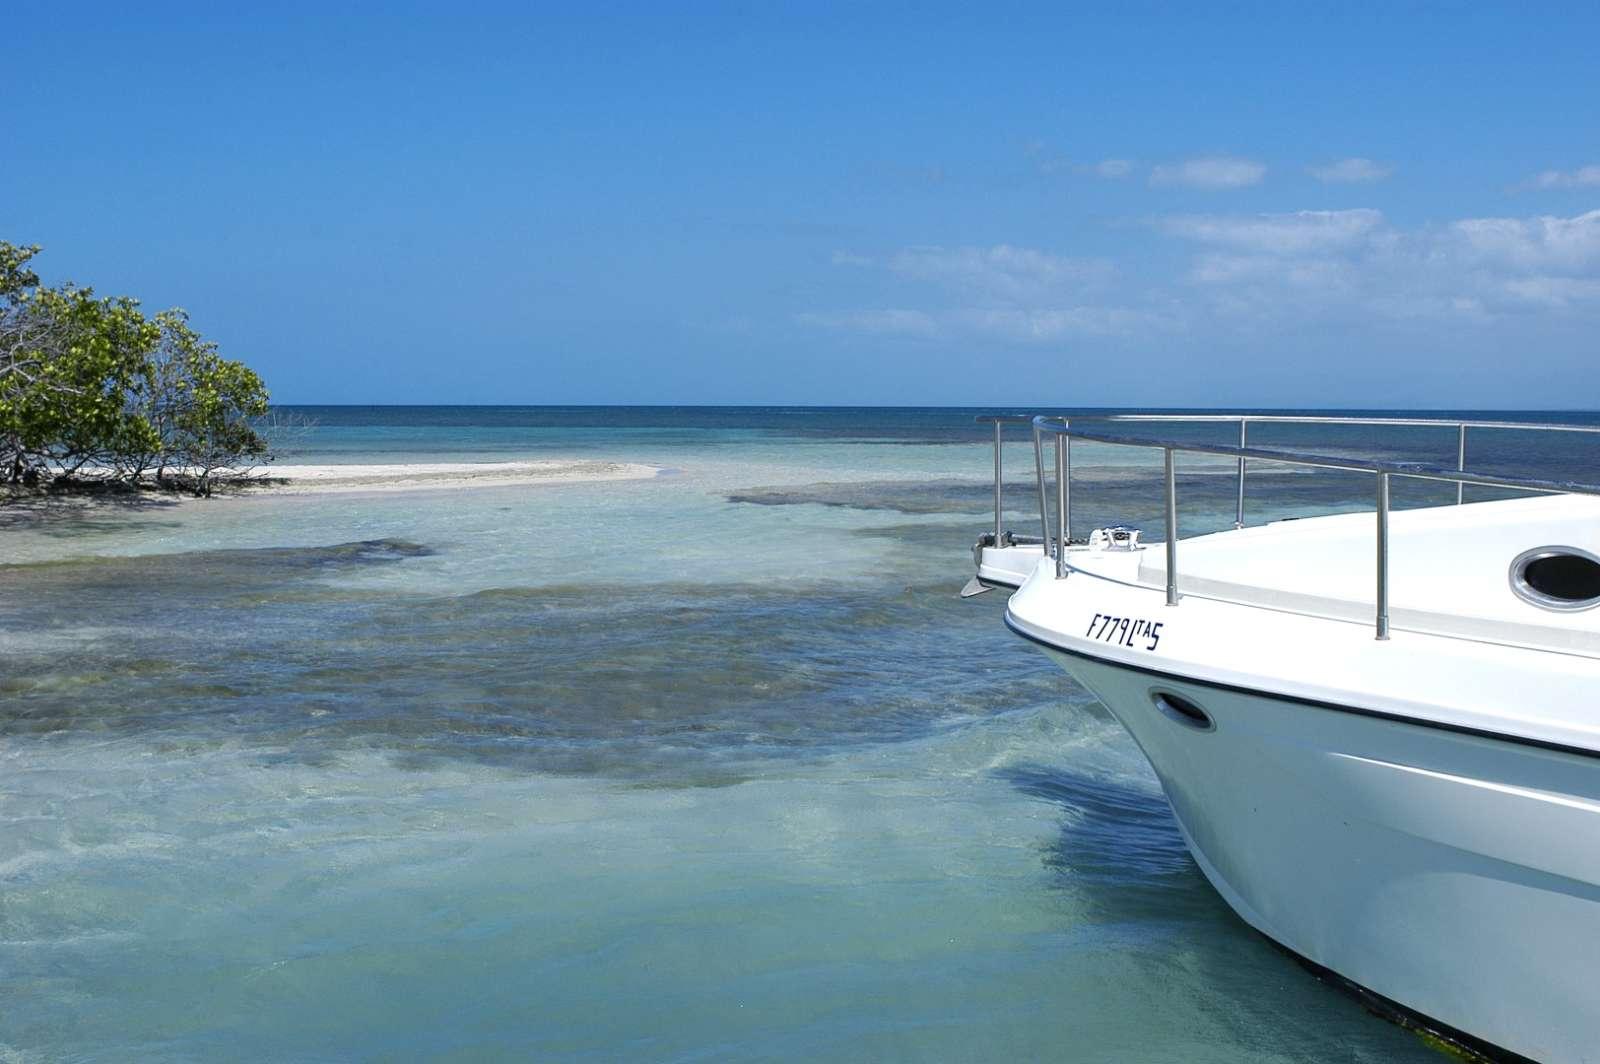 Cayo Blanco, near Trinidad in Cuba